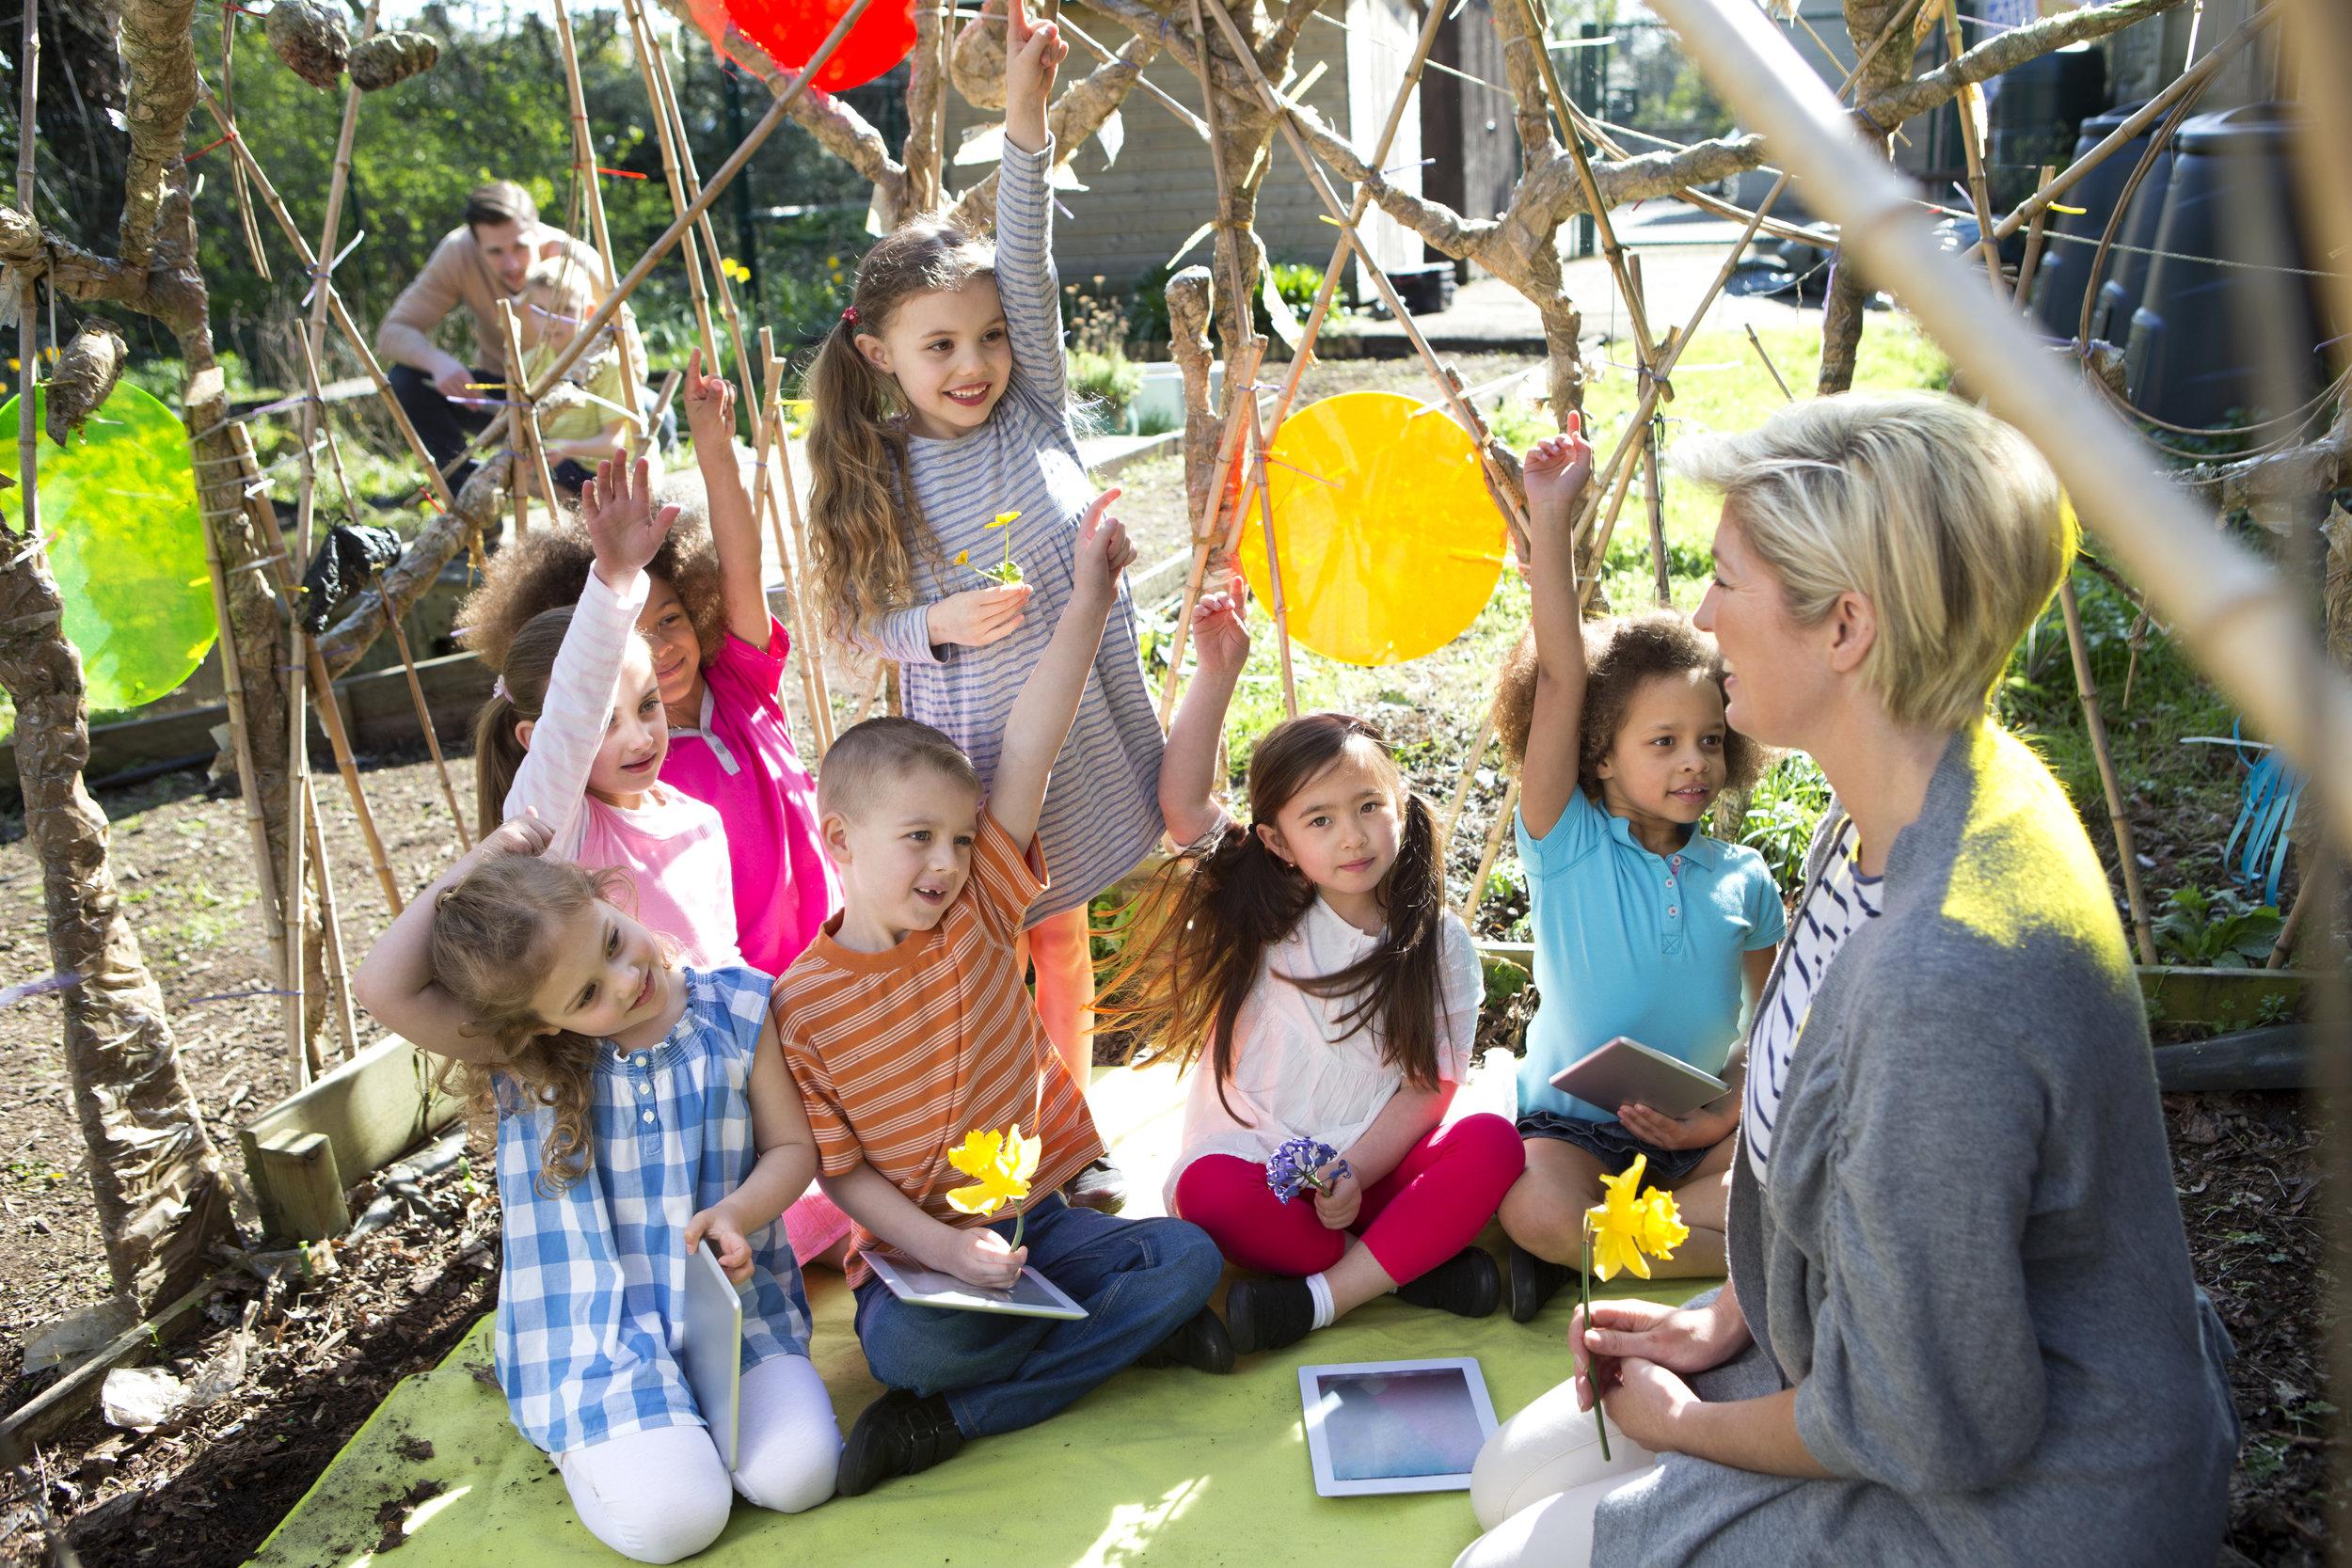 Kids Sitting Outside.jpg